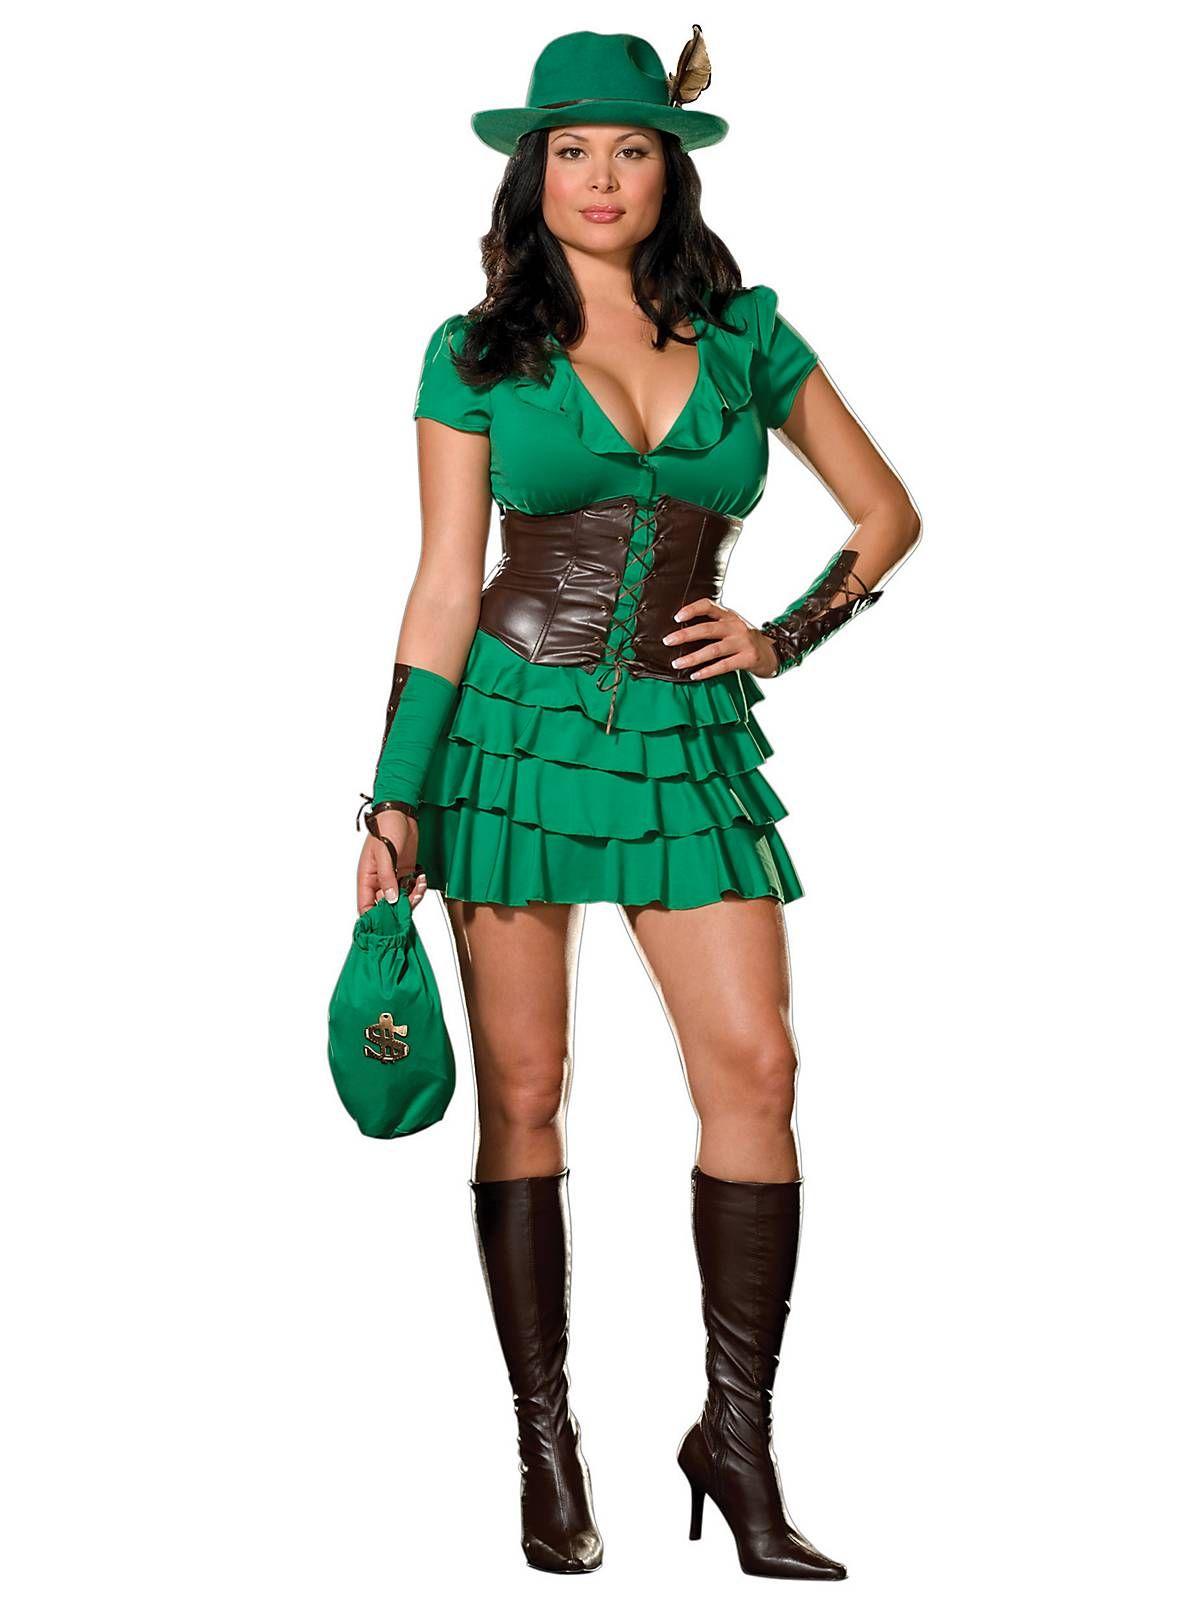 Dreamgirl Plus Size Robyn Da Hood Costume - Sexy Robin Hood - Candy Apple Costumes  sc 1 st  Pinterest & Robyn Da Hood Adult Costume | Plus Size Fairytale Costumes | Sexy ...